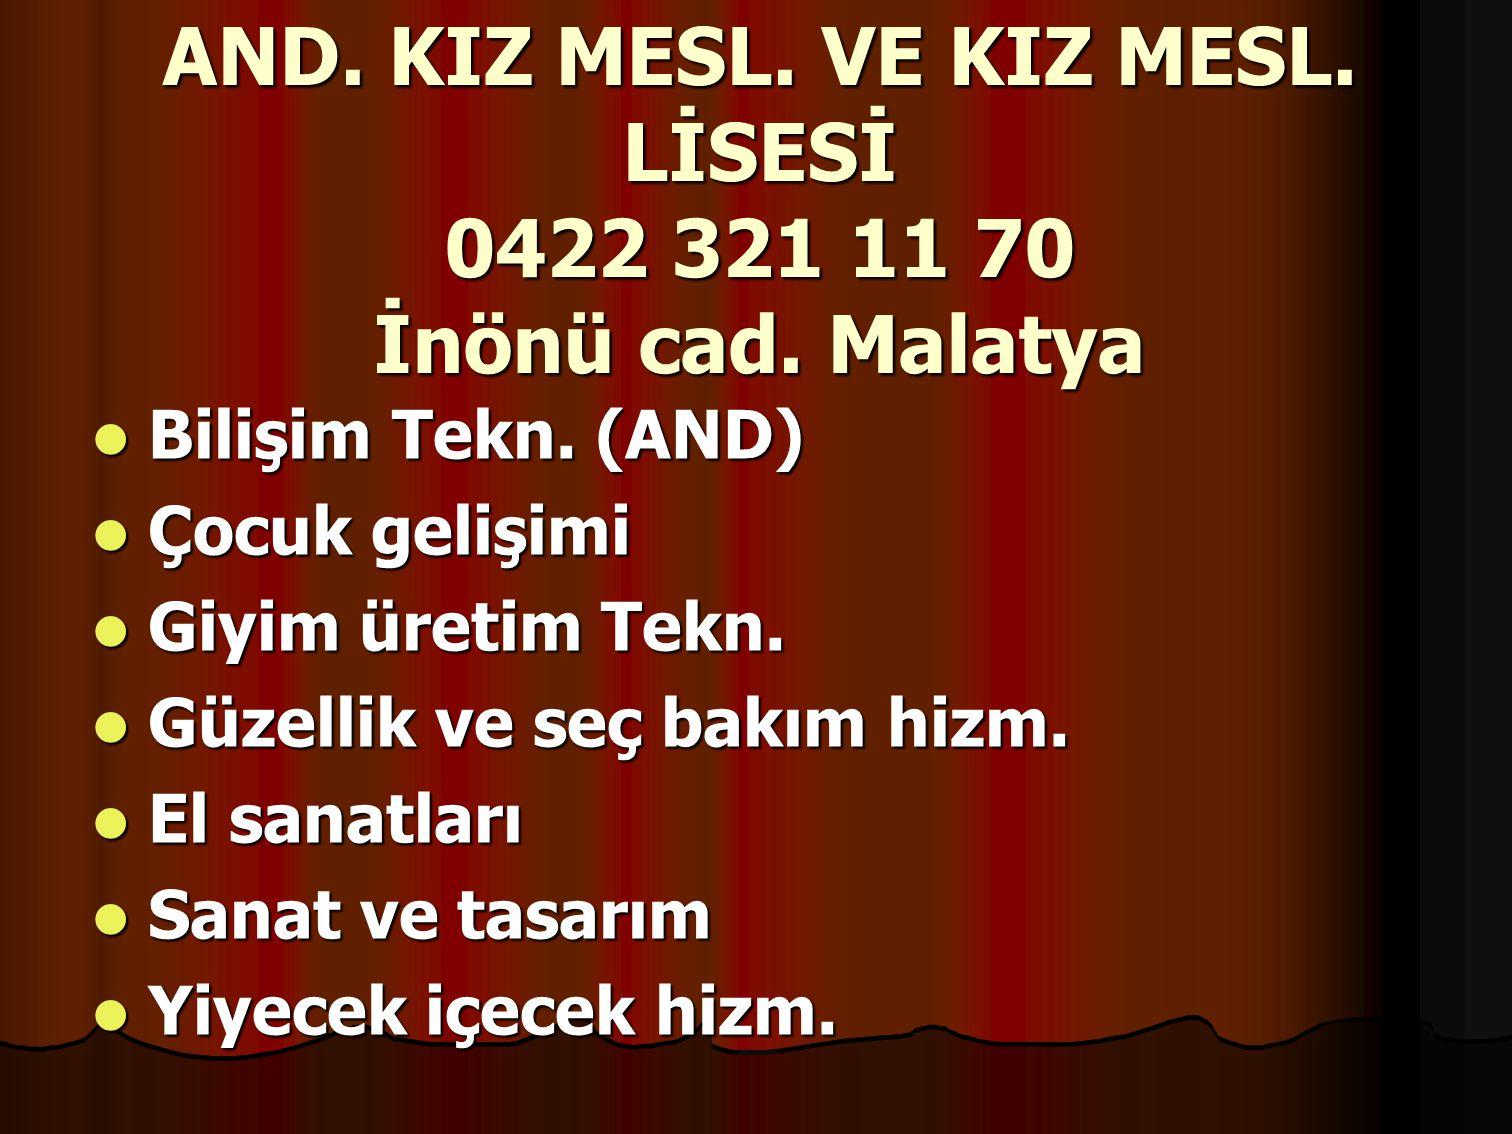 AND.KIZ MESL. VE KIZ MESL. LİSESİ 0422 321 11 70 İnönü cad.